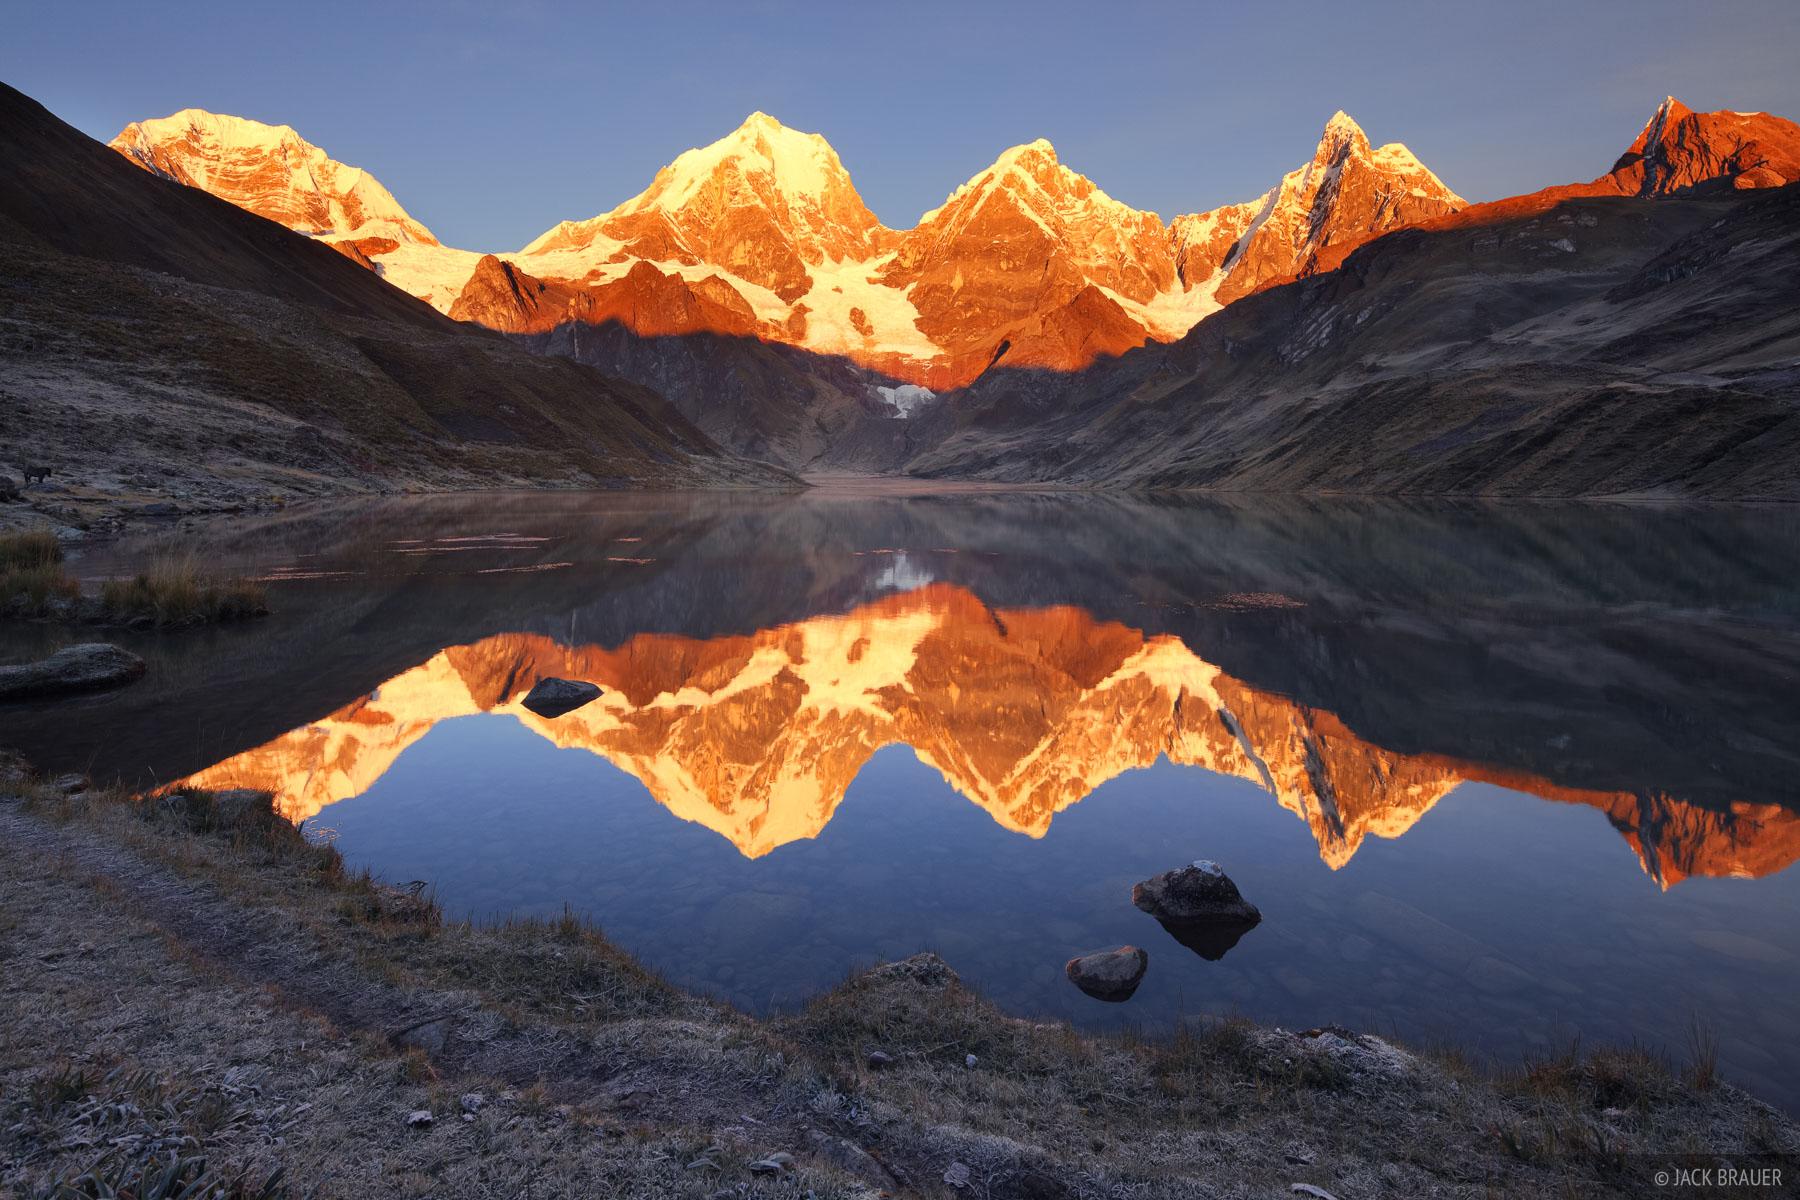 Brilliant sunrise alpenglow on the tallest peaks of the Cordillera Huayhuash (Yerupaja, Yerupaja Chico, and Jirishanca), reflected...